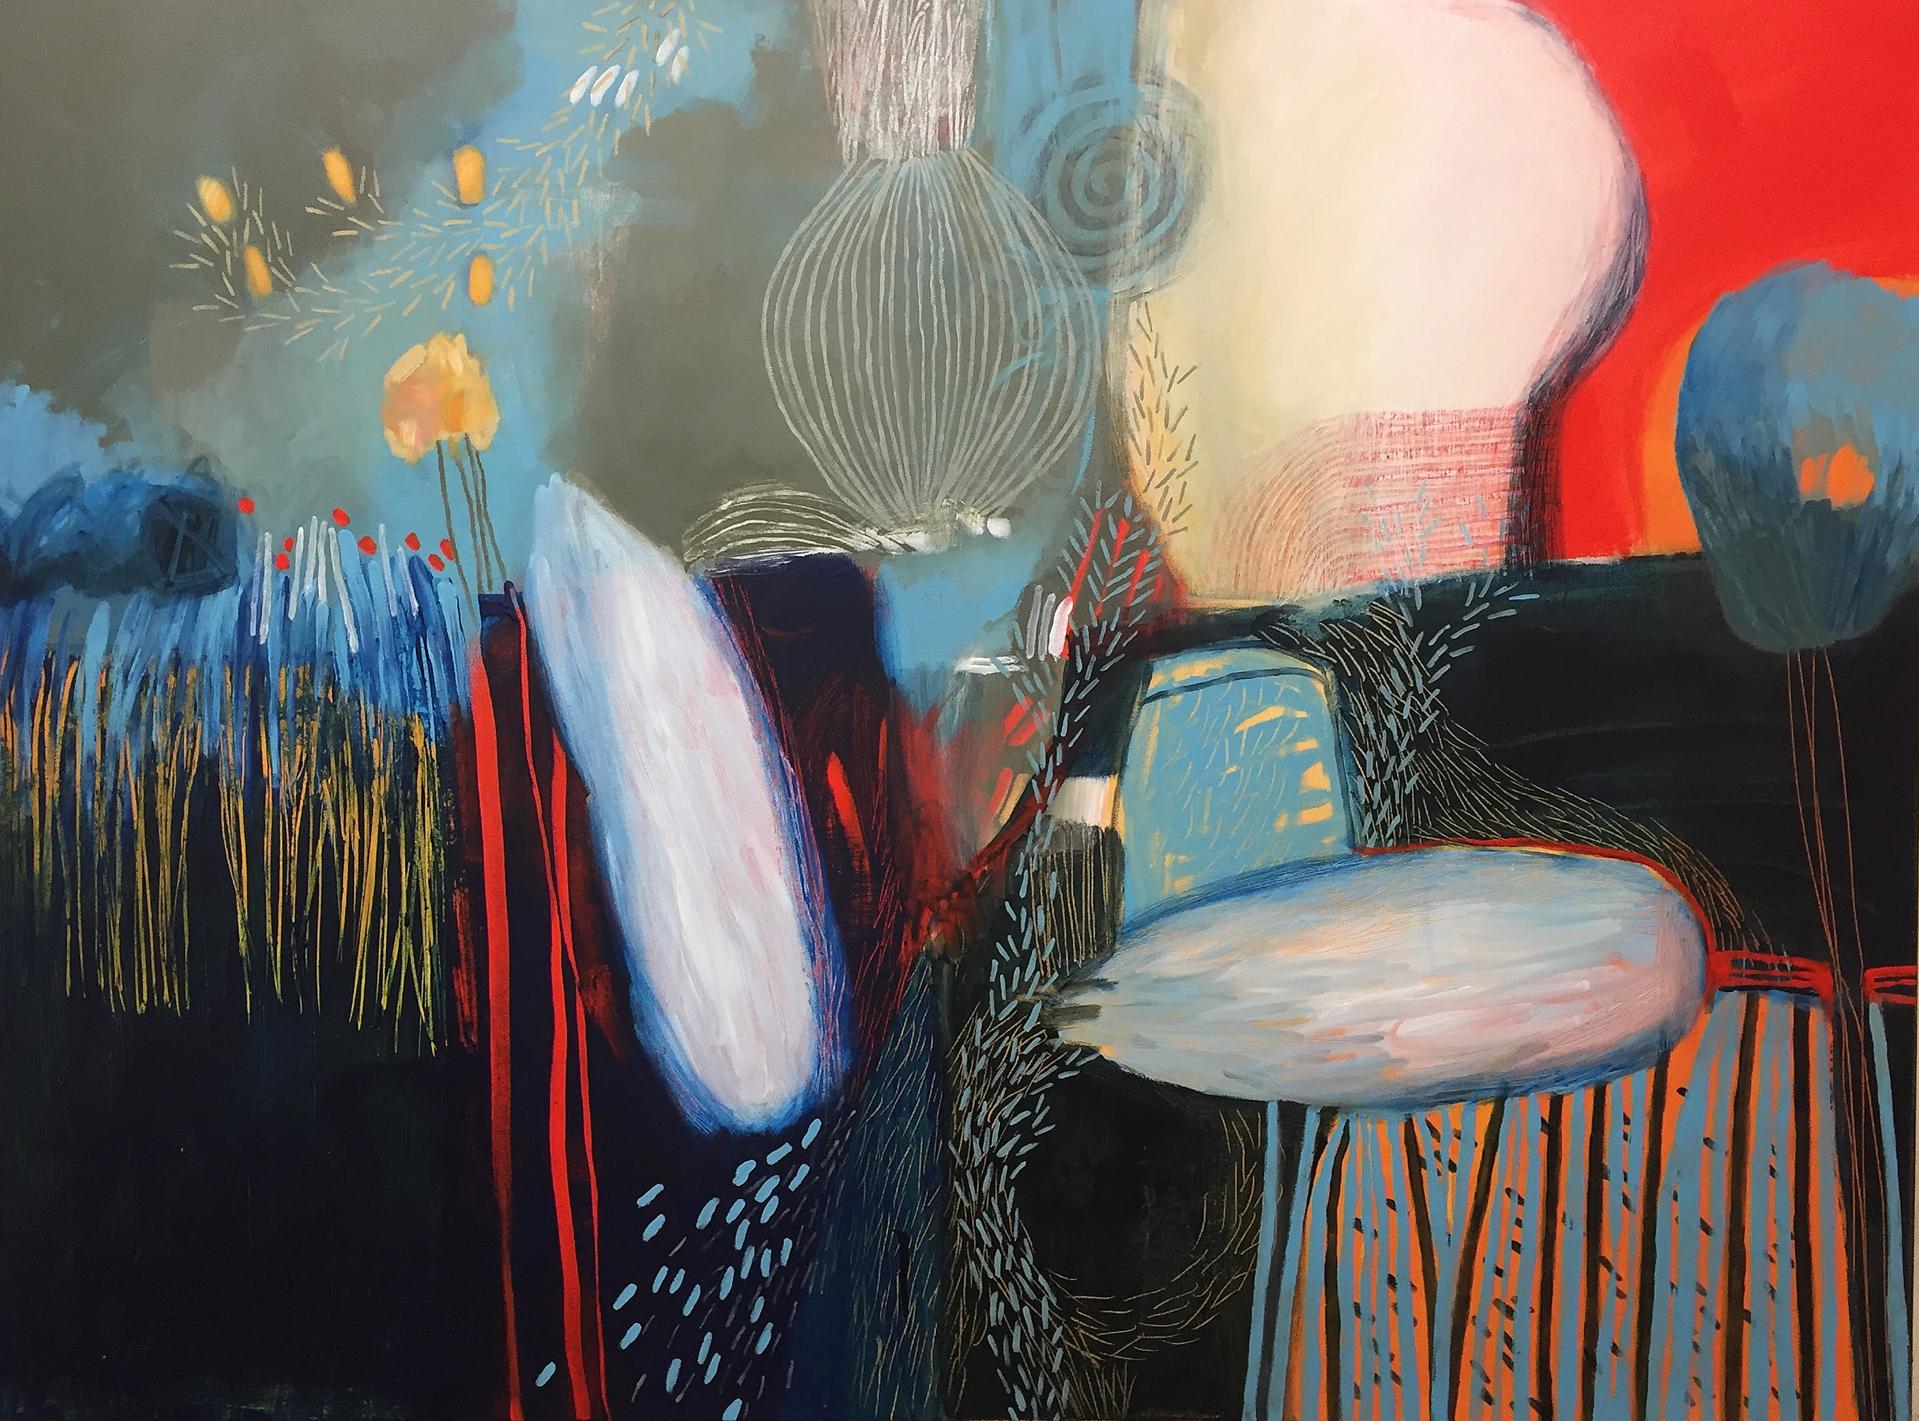 Untitled 198980 by Karen Roehl